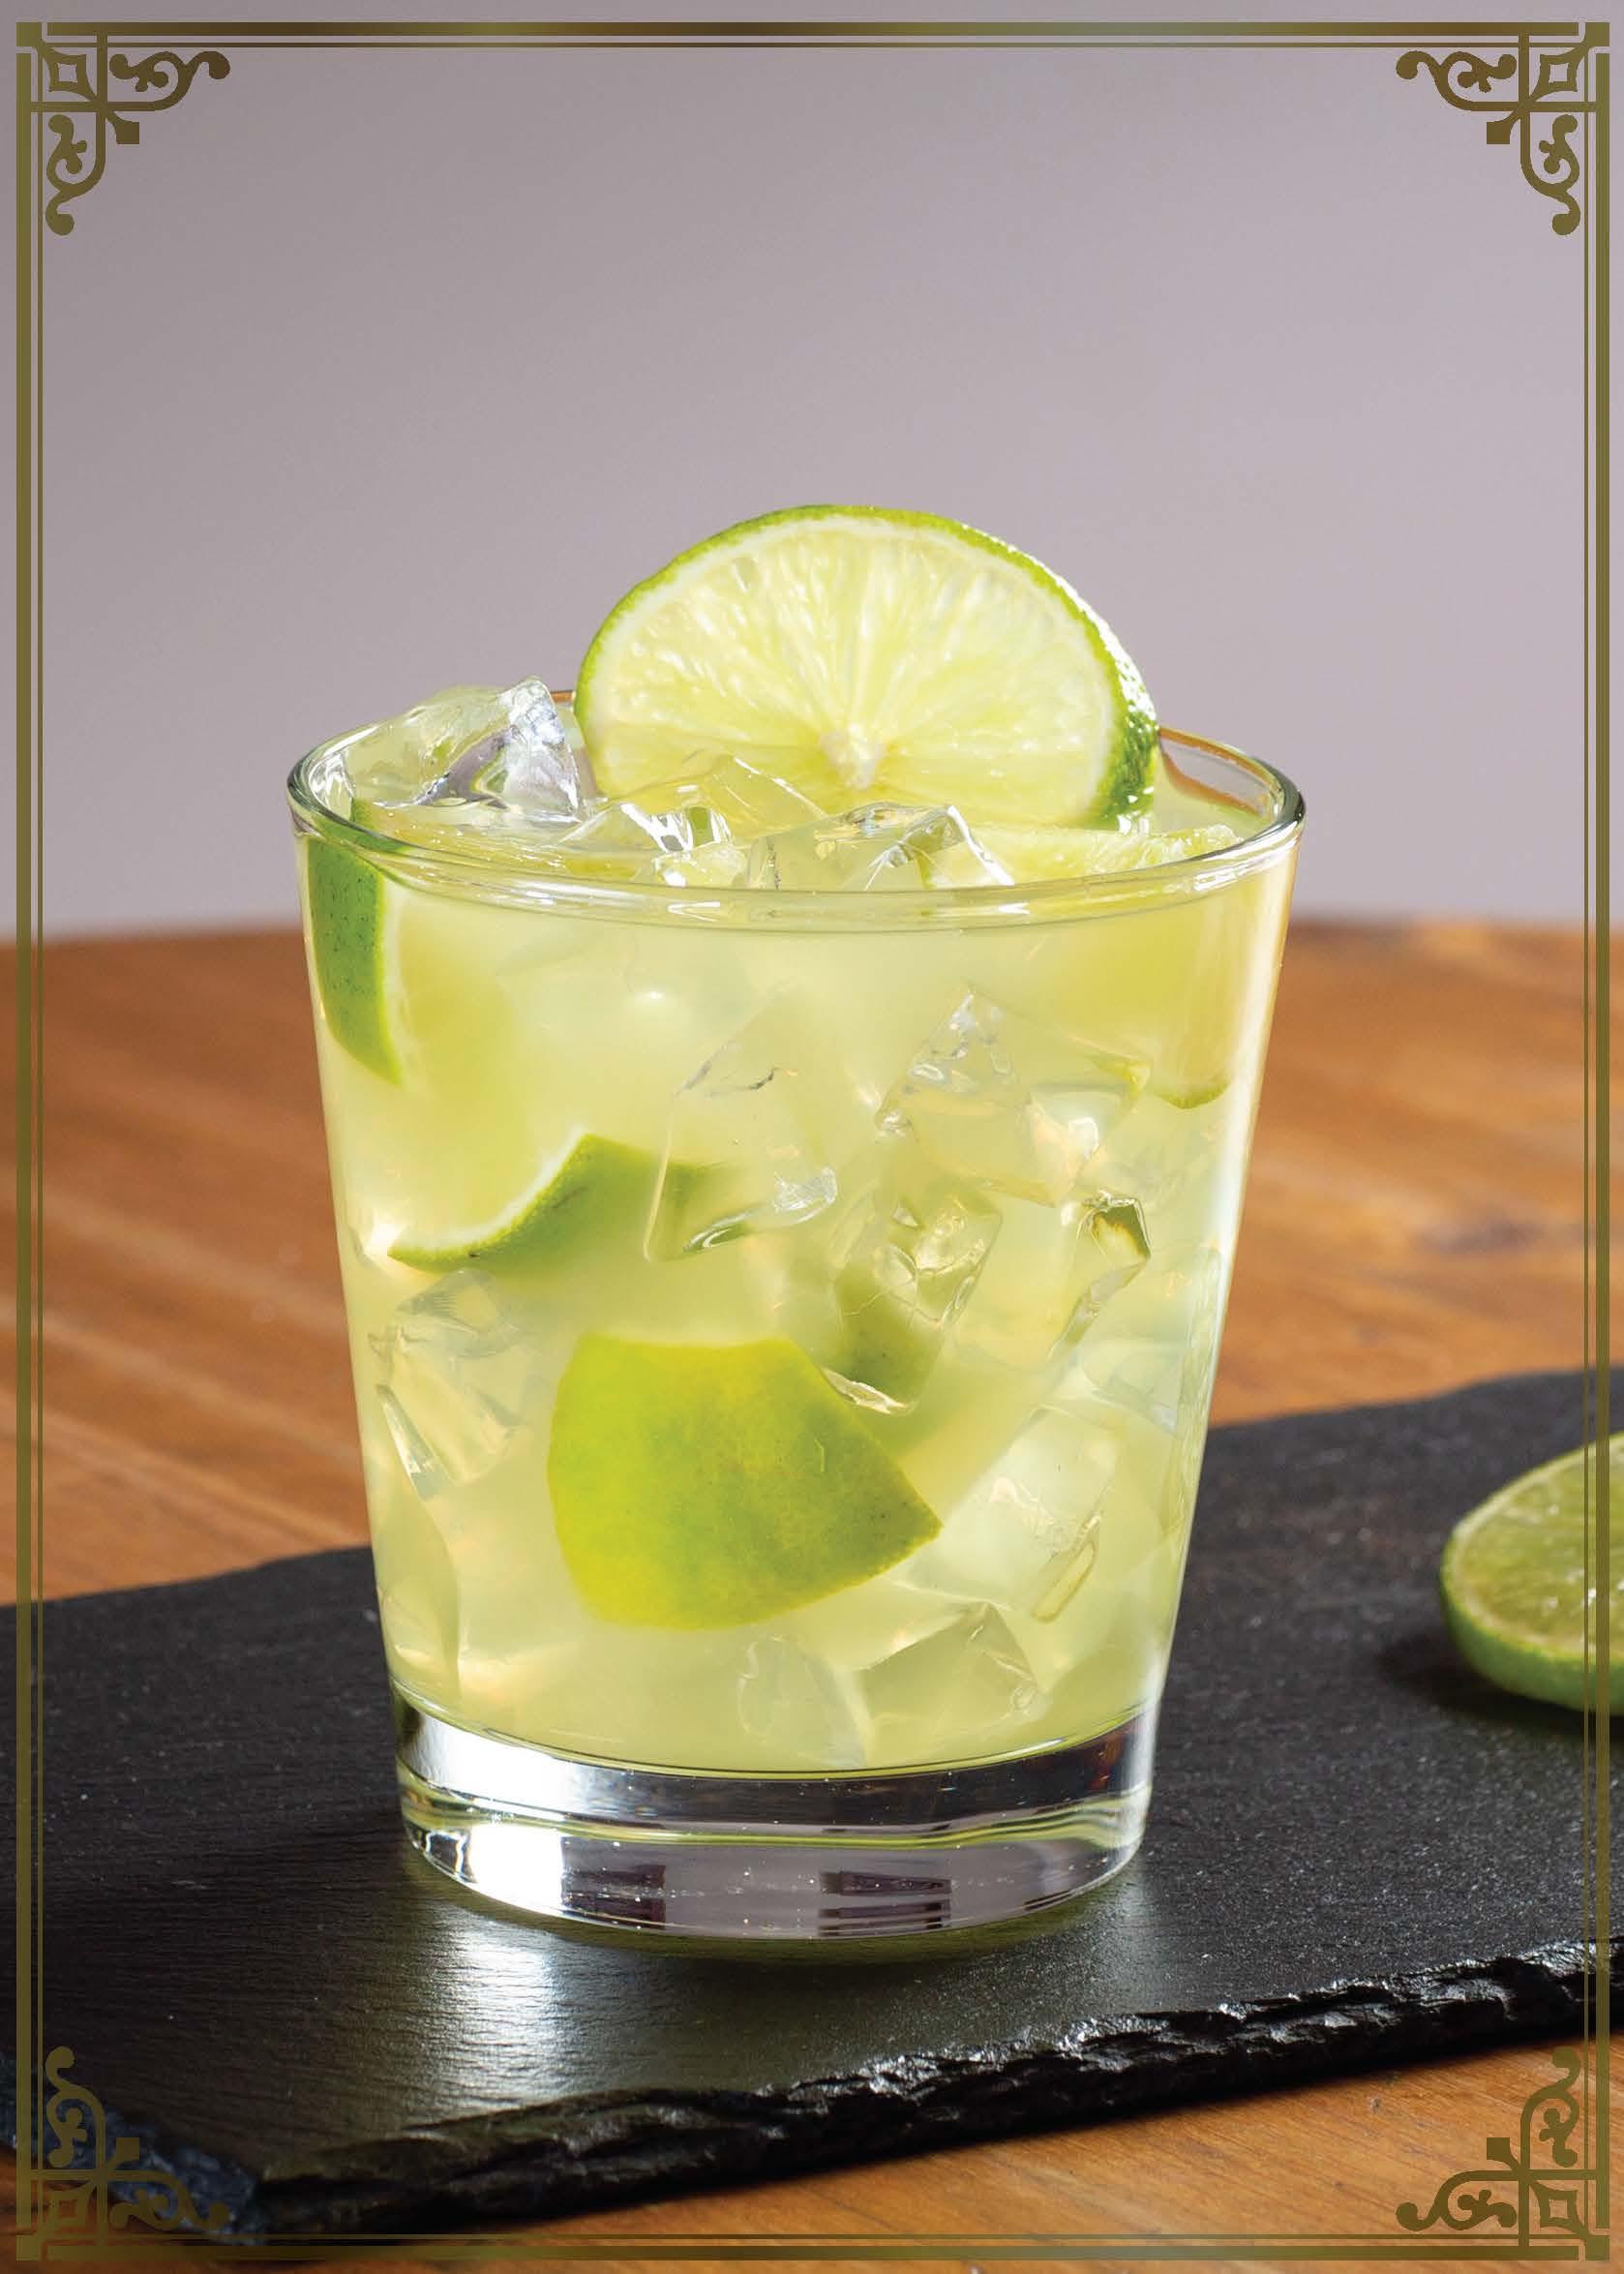 limon-caipirina